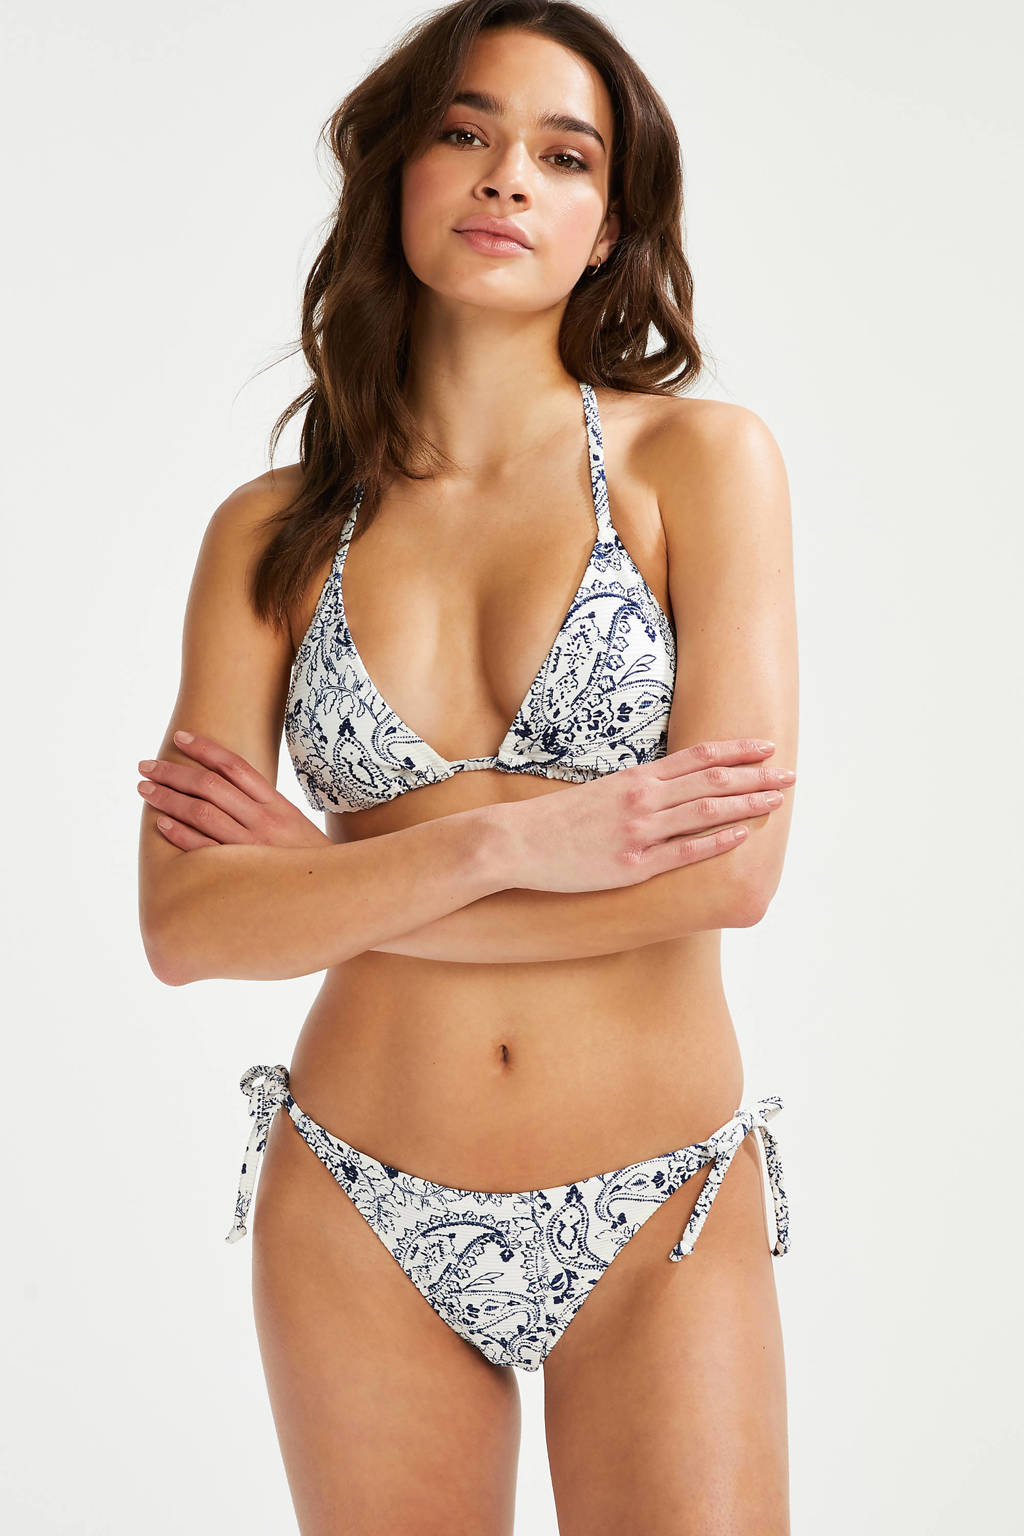 Hunkemöller triangel bikinitop met all over print wit/donkerblauw, Wit/donkerbrlauw